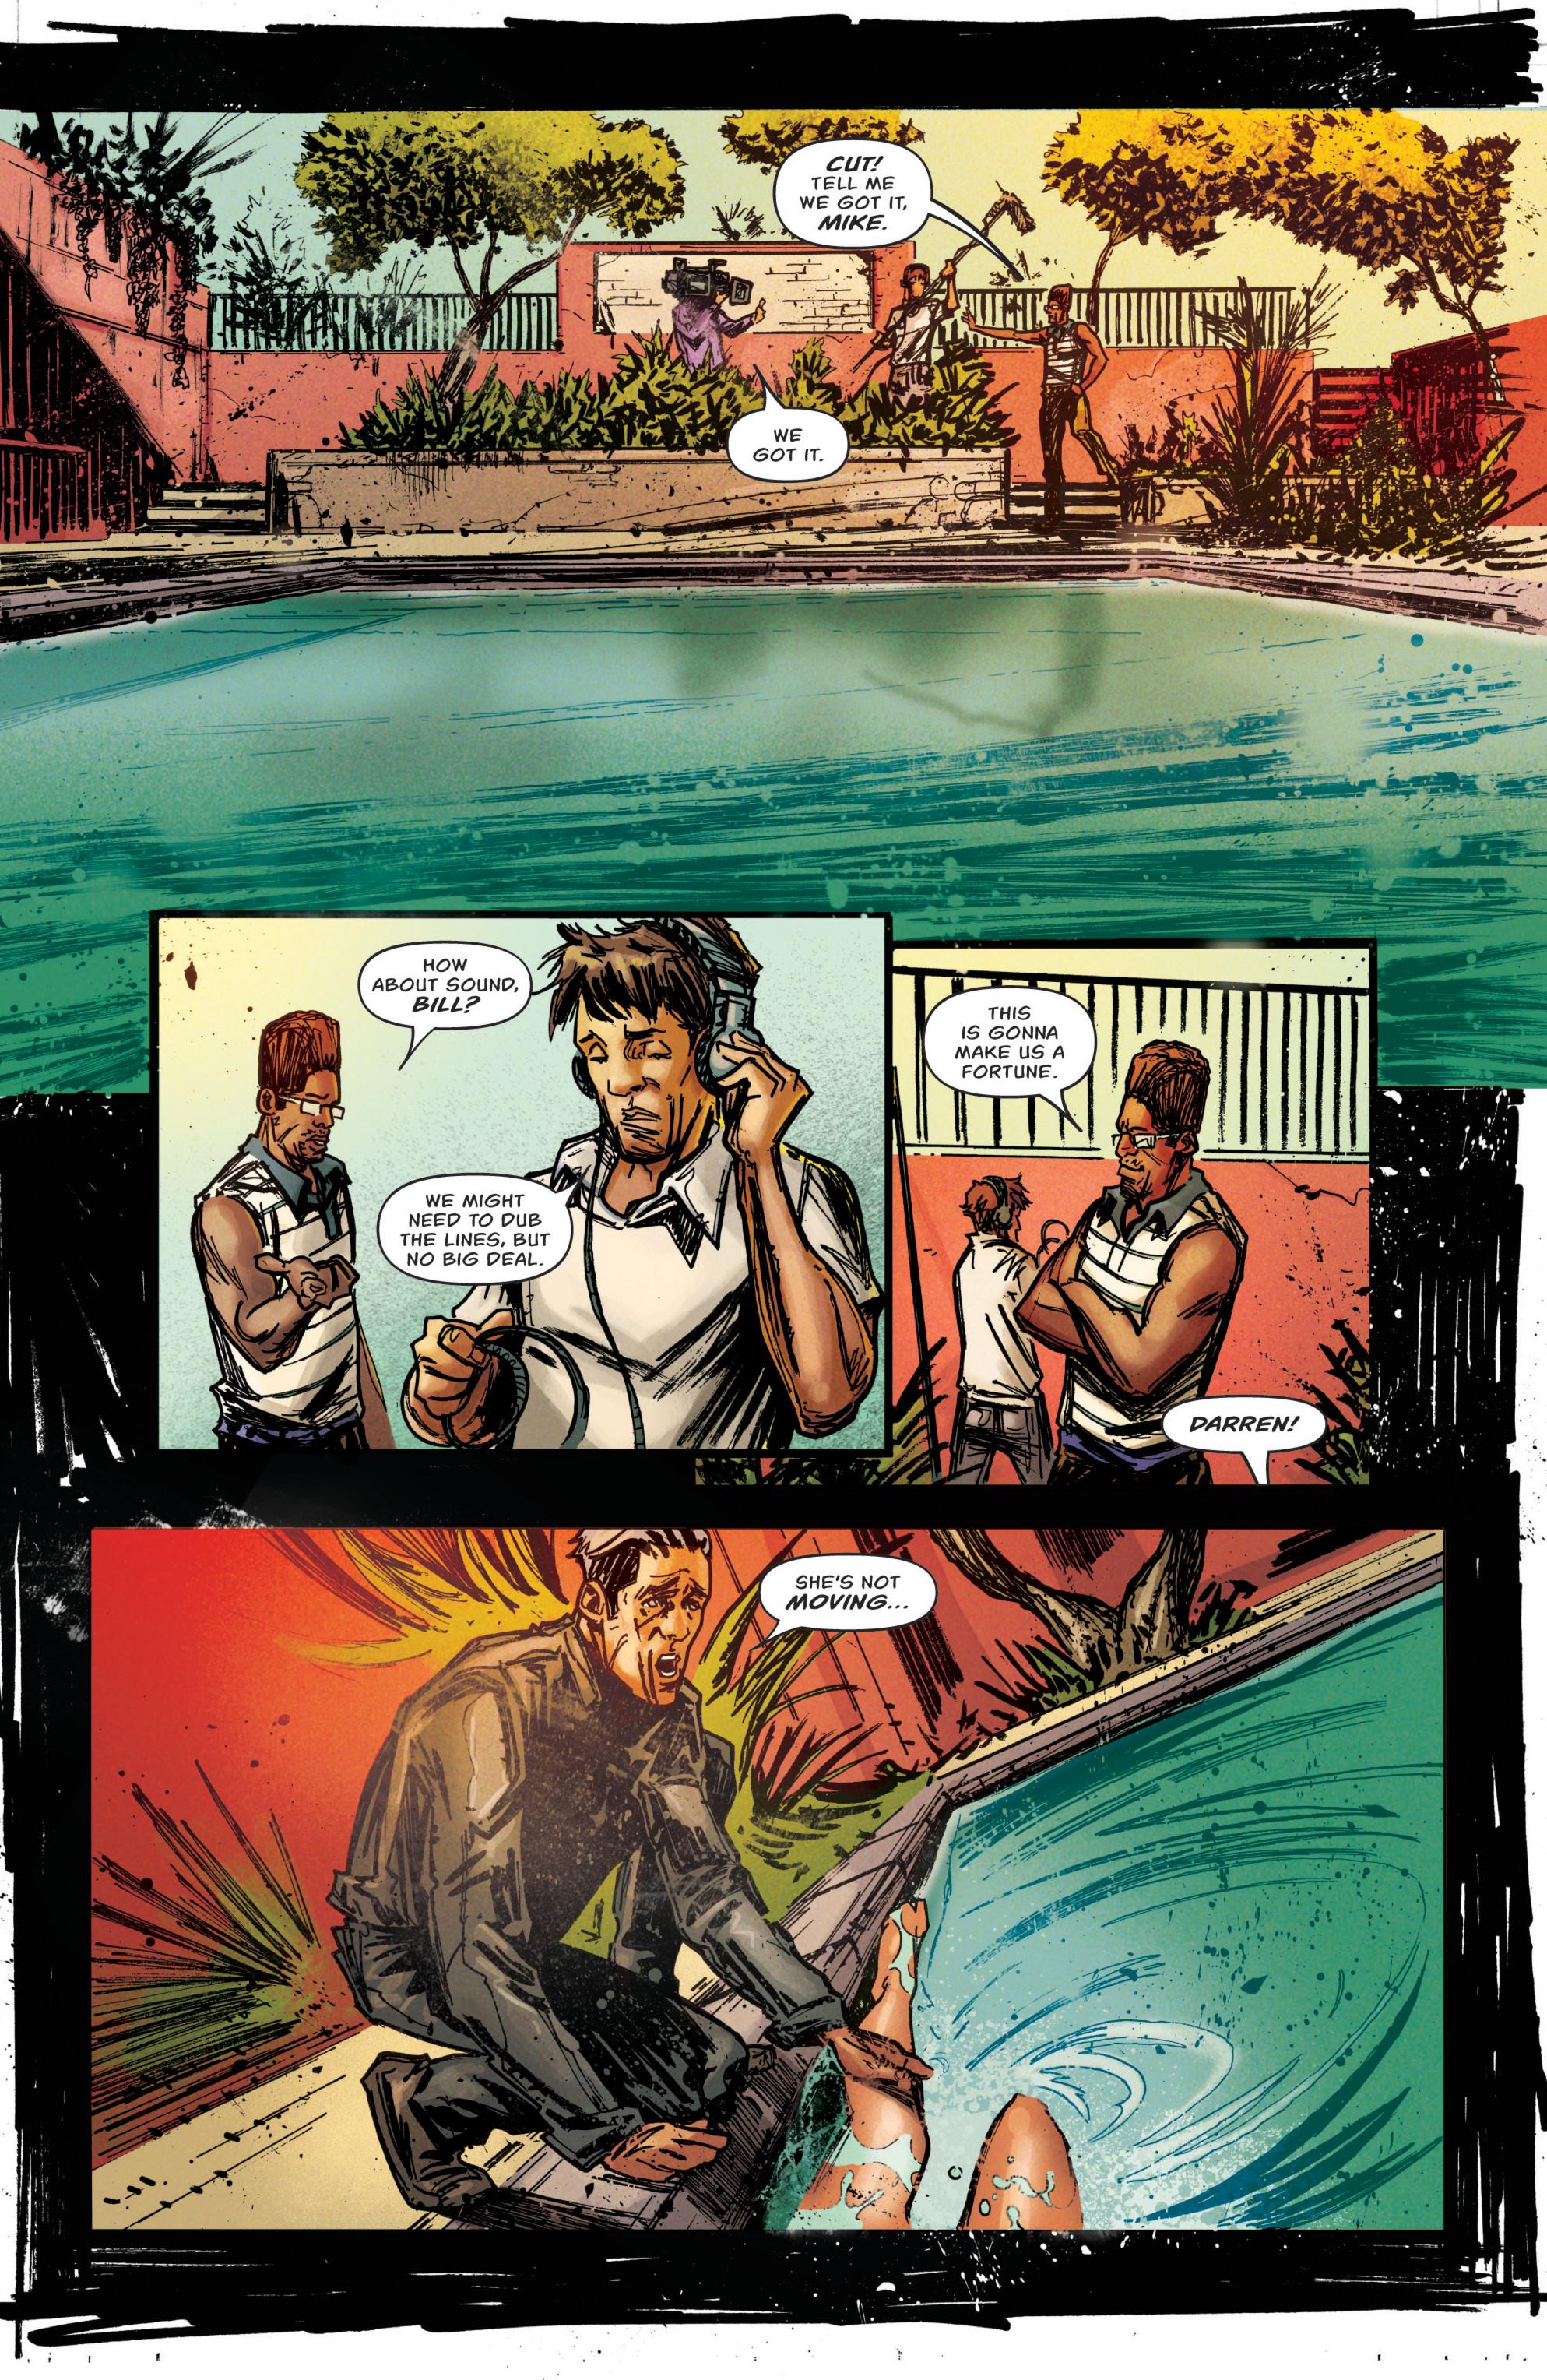 Read online Grimm Tales of Terror: Vol. 3 comic -  Issue #5 - 6